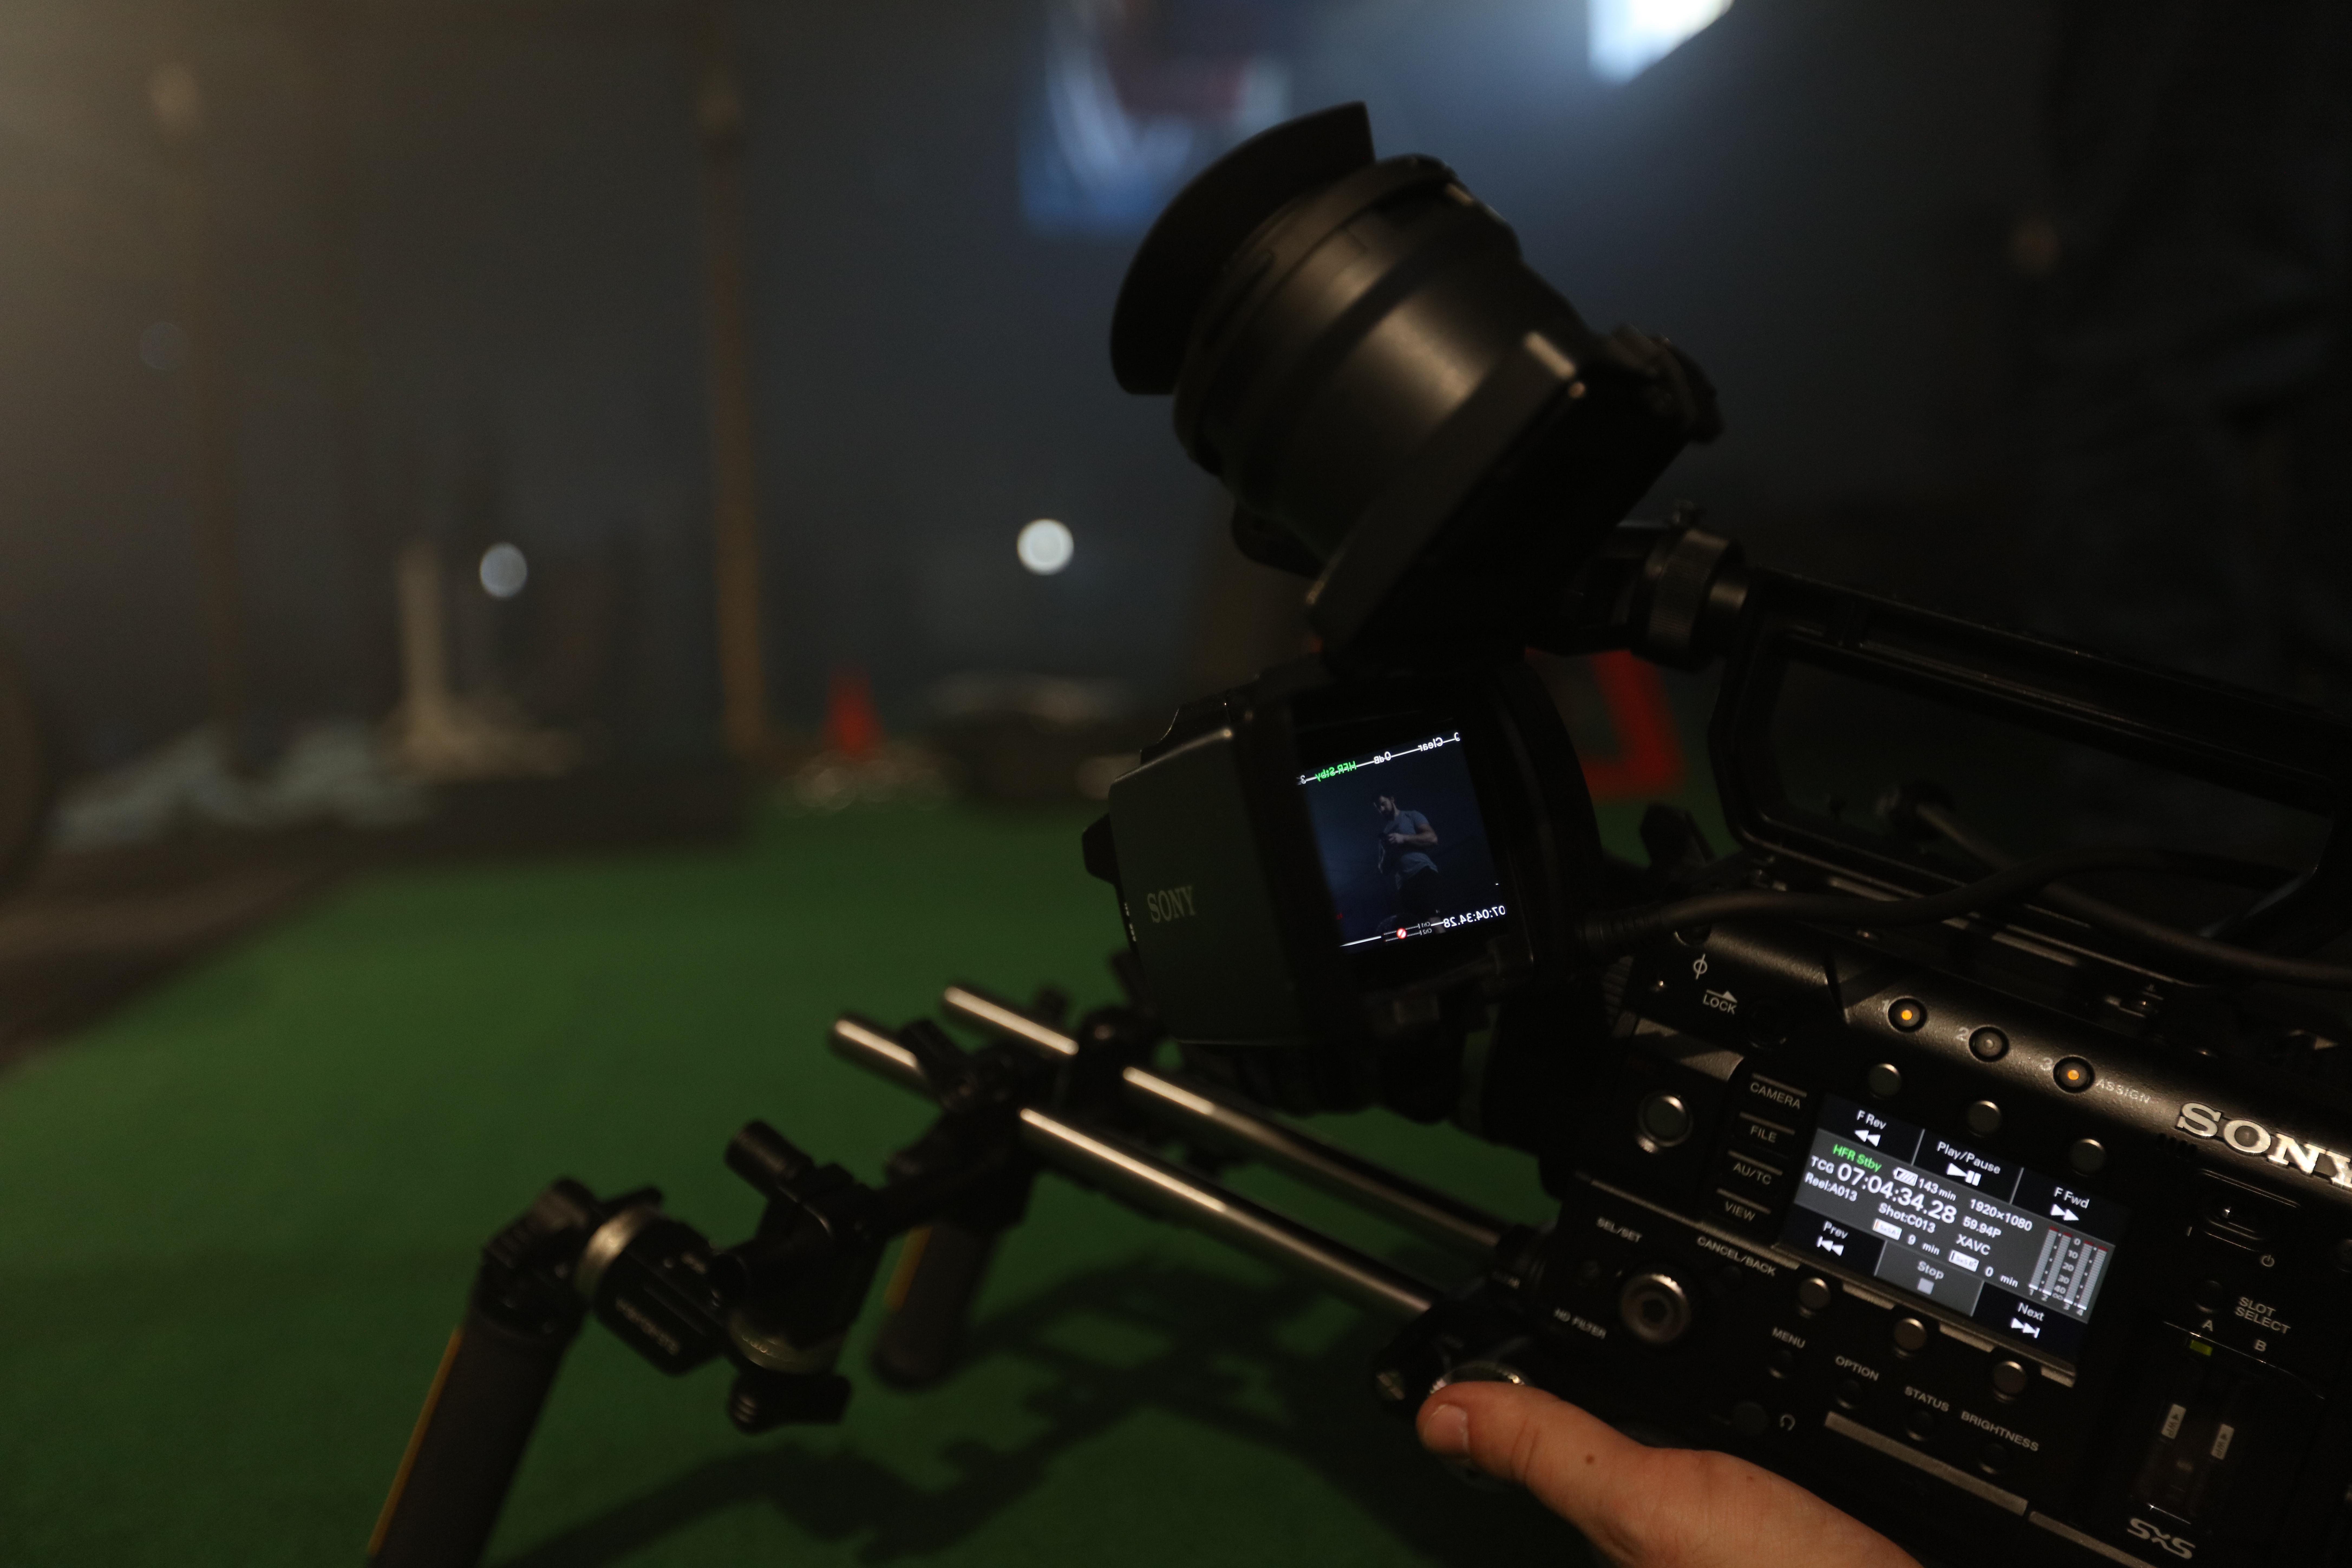 Sony F5 Video Camera